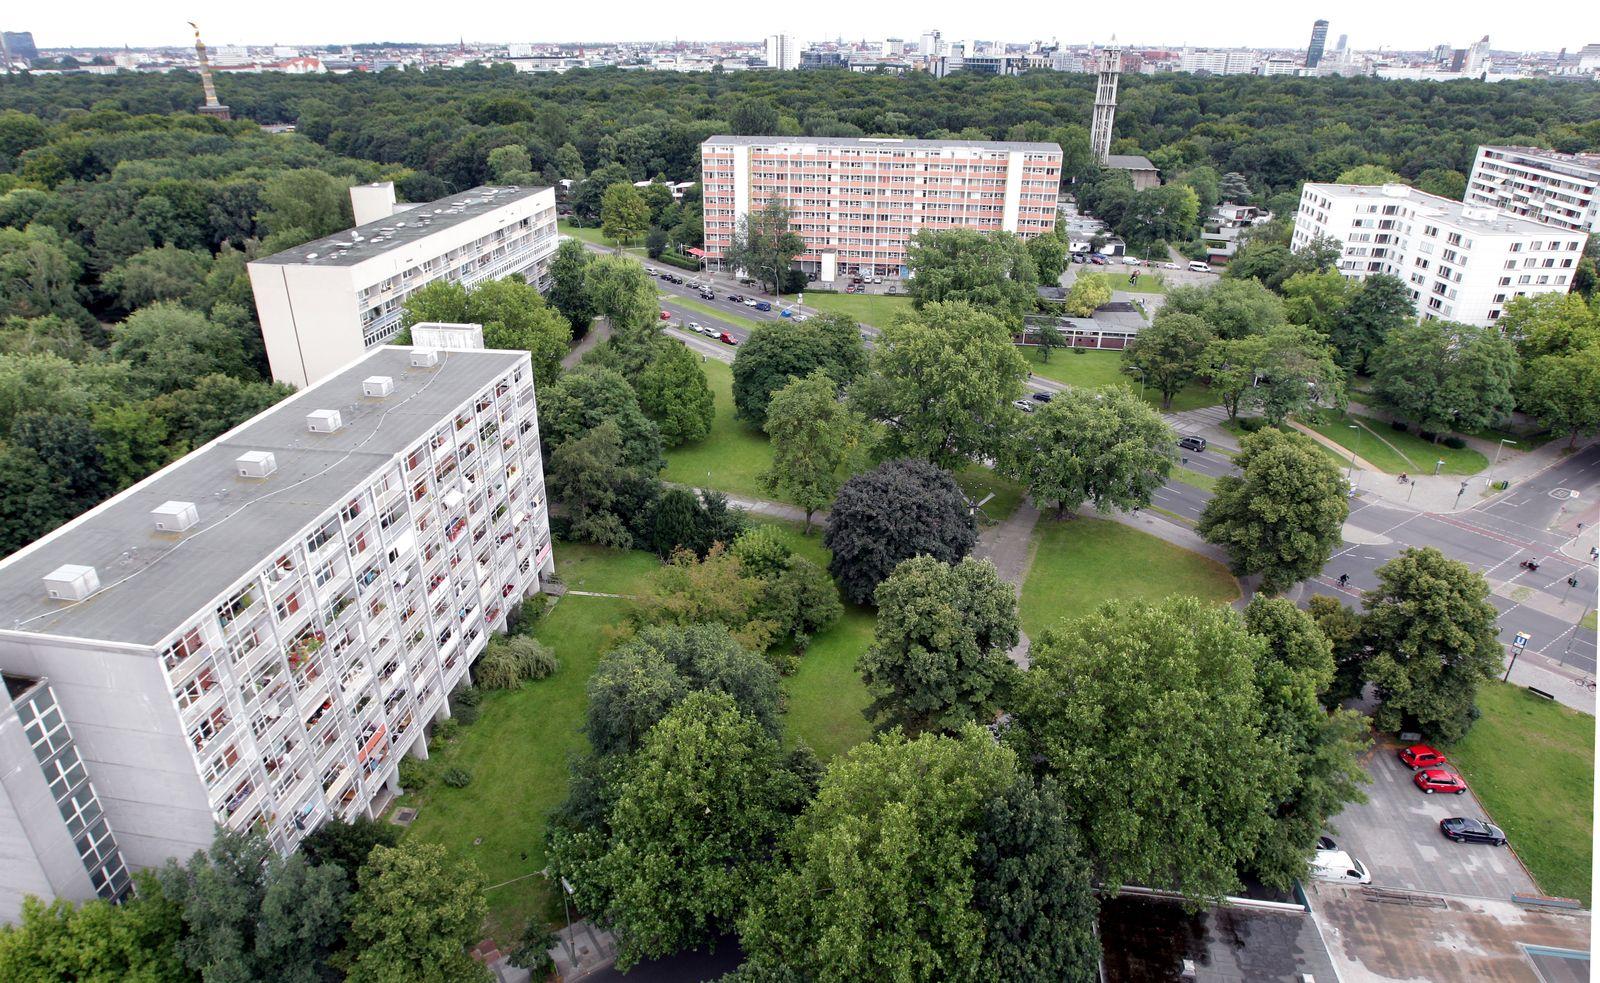 Berlin / Stadtteil / Immobilien / Tiergarten / Hansaviertel